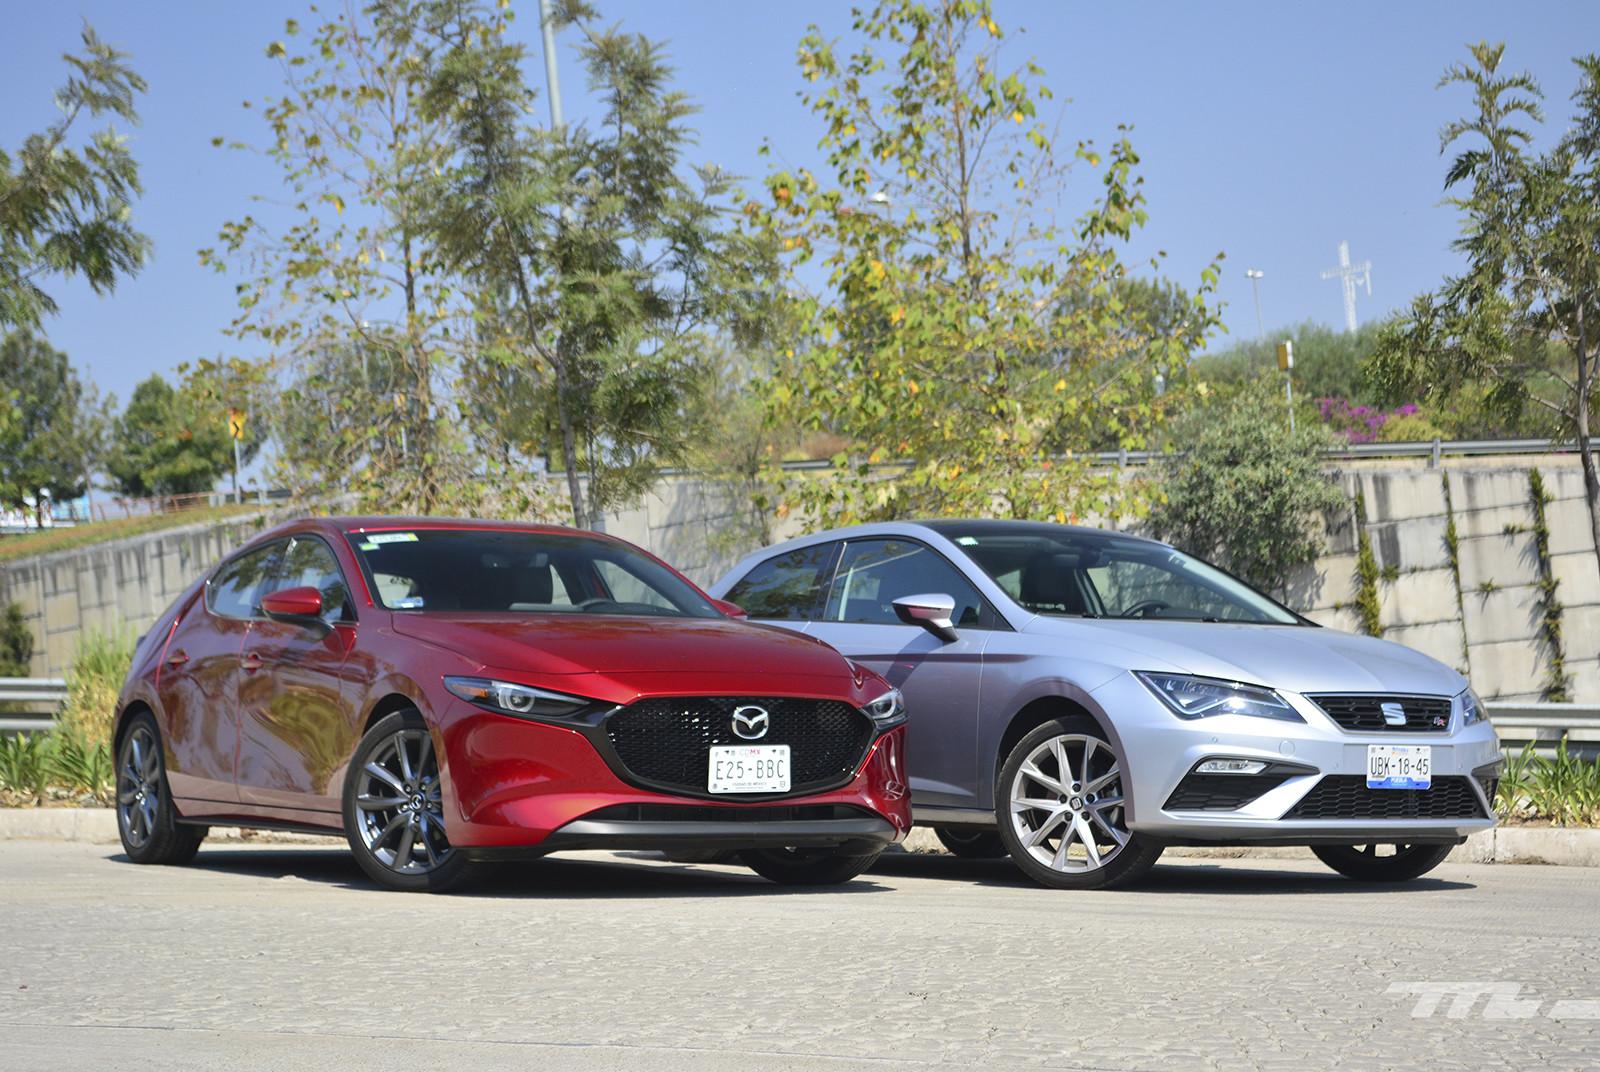 Foto de Mazda 3 vs. SEAT León (comparativa) (10/28)